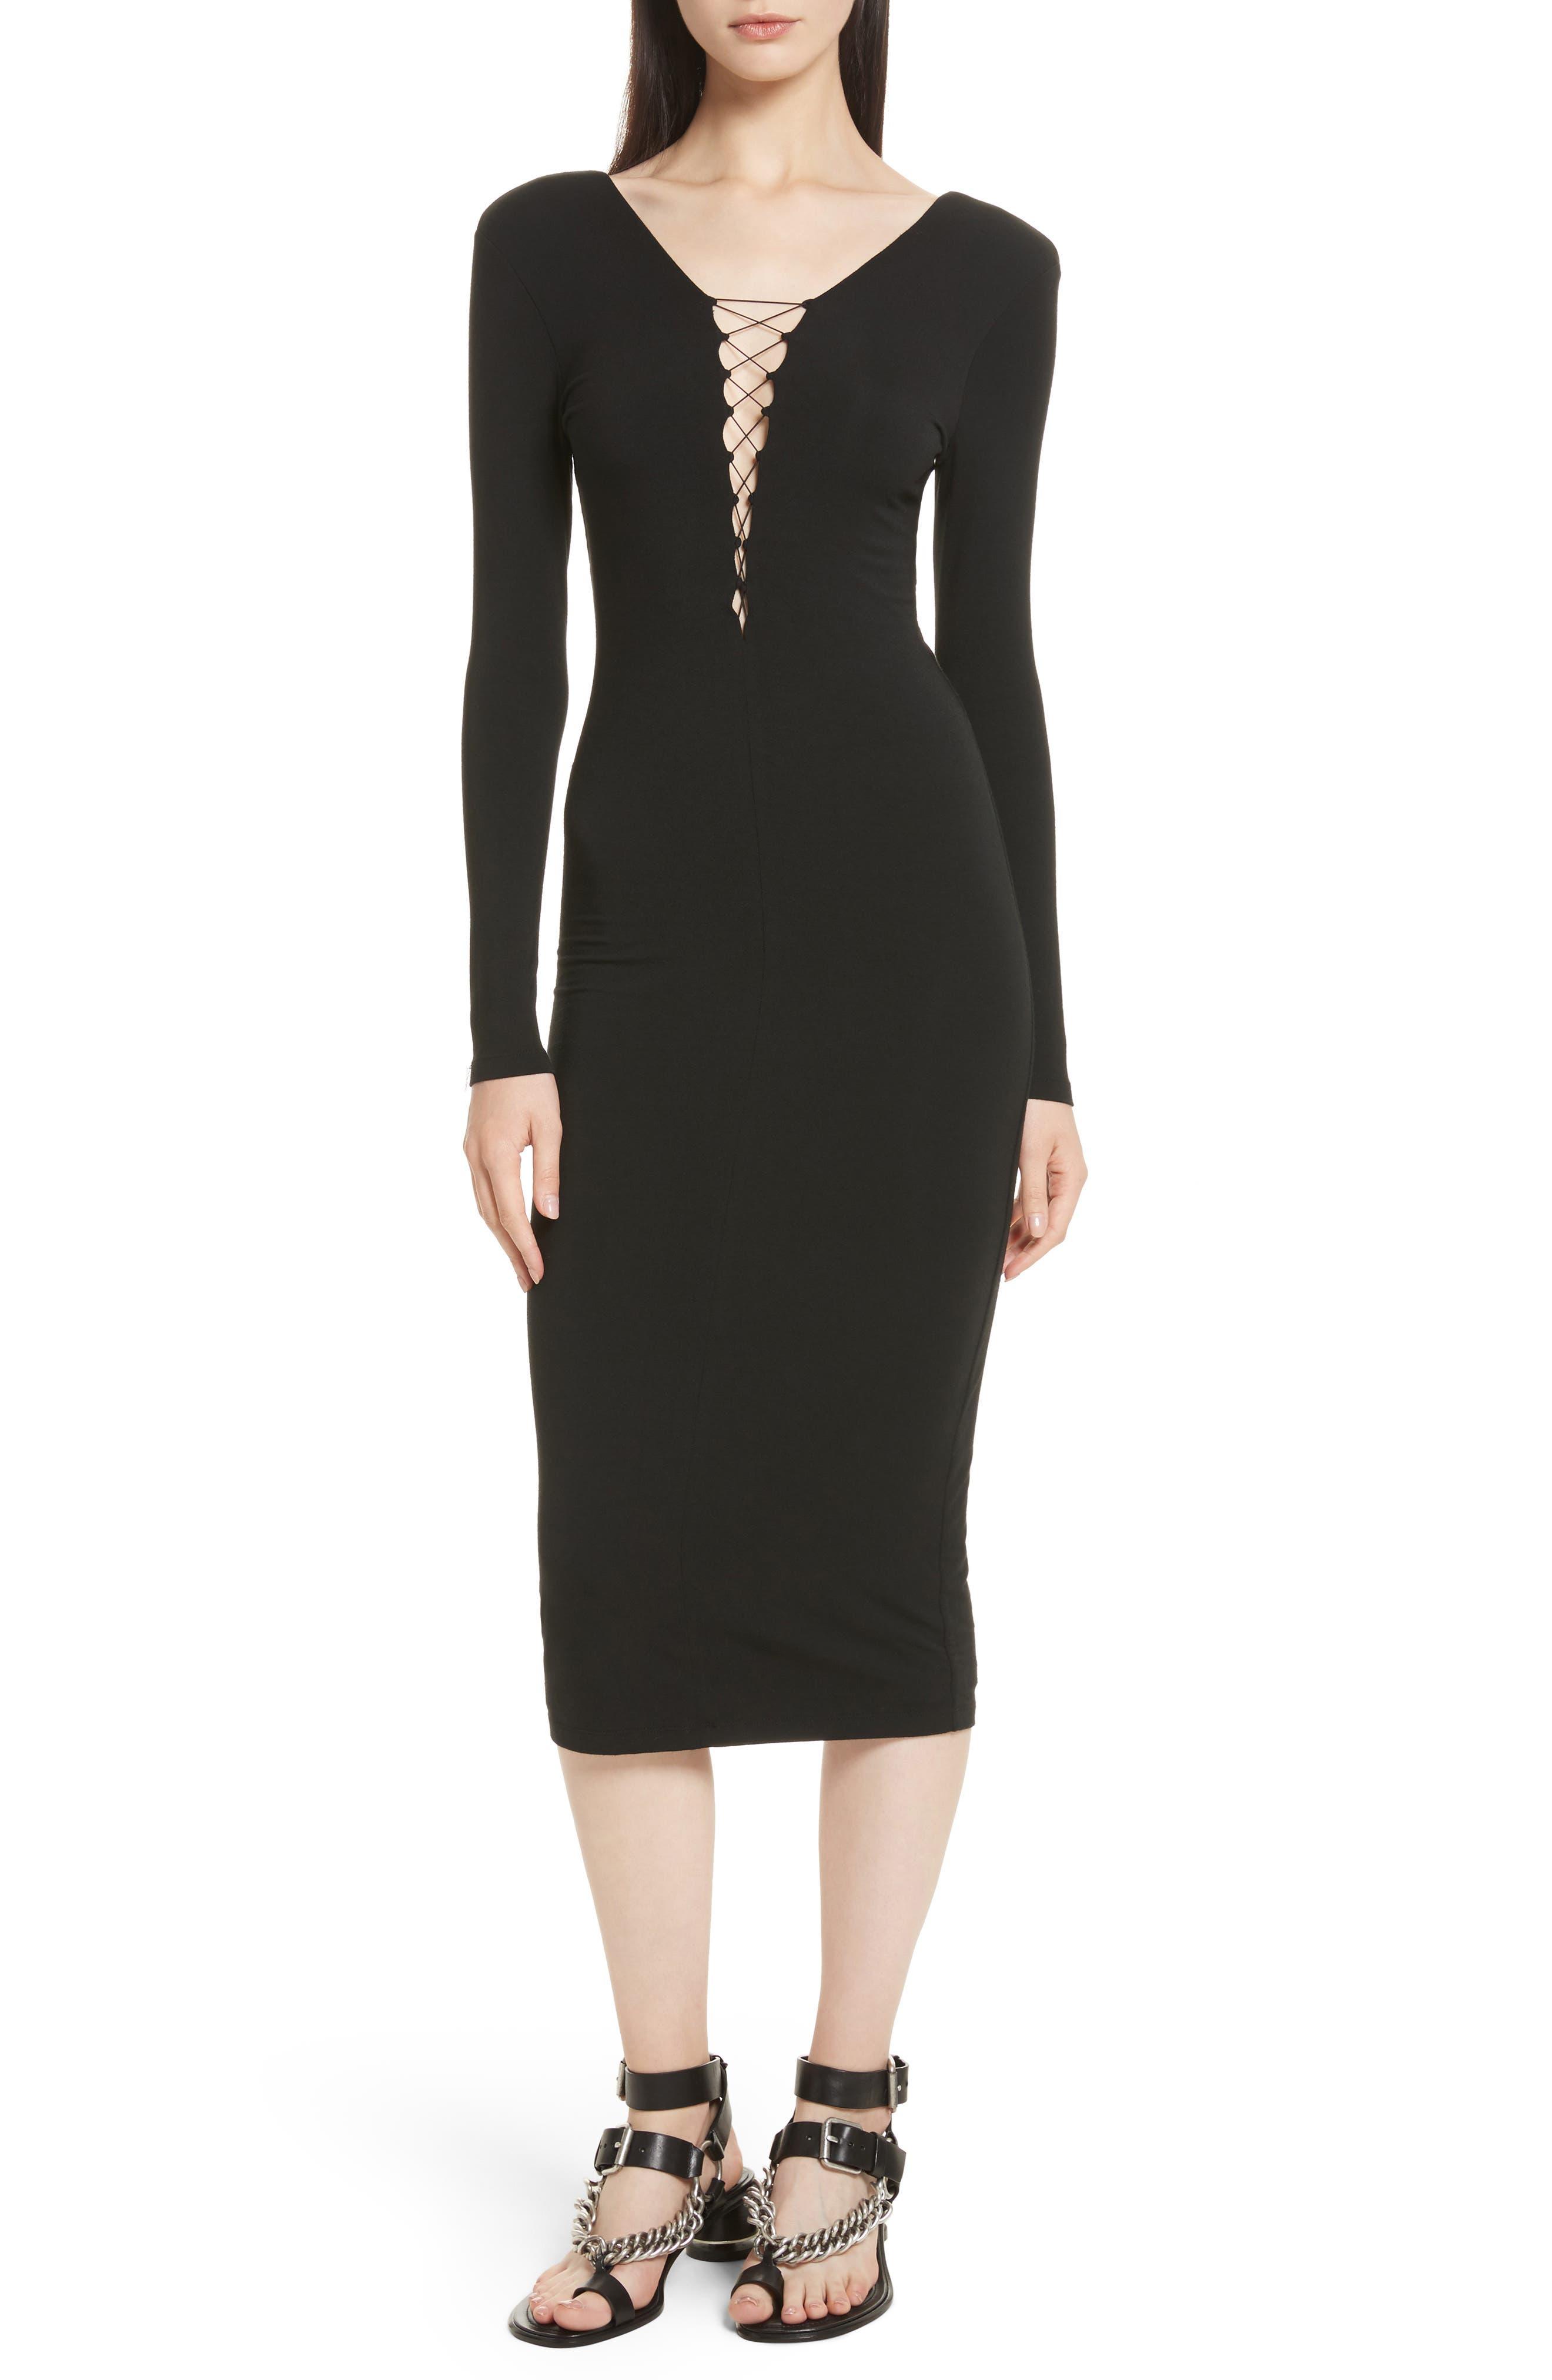 T by Alexander Wang Lace-Up Stretch Jersey Midi Dress